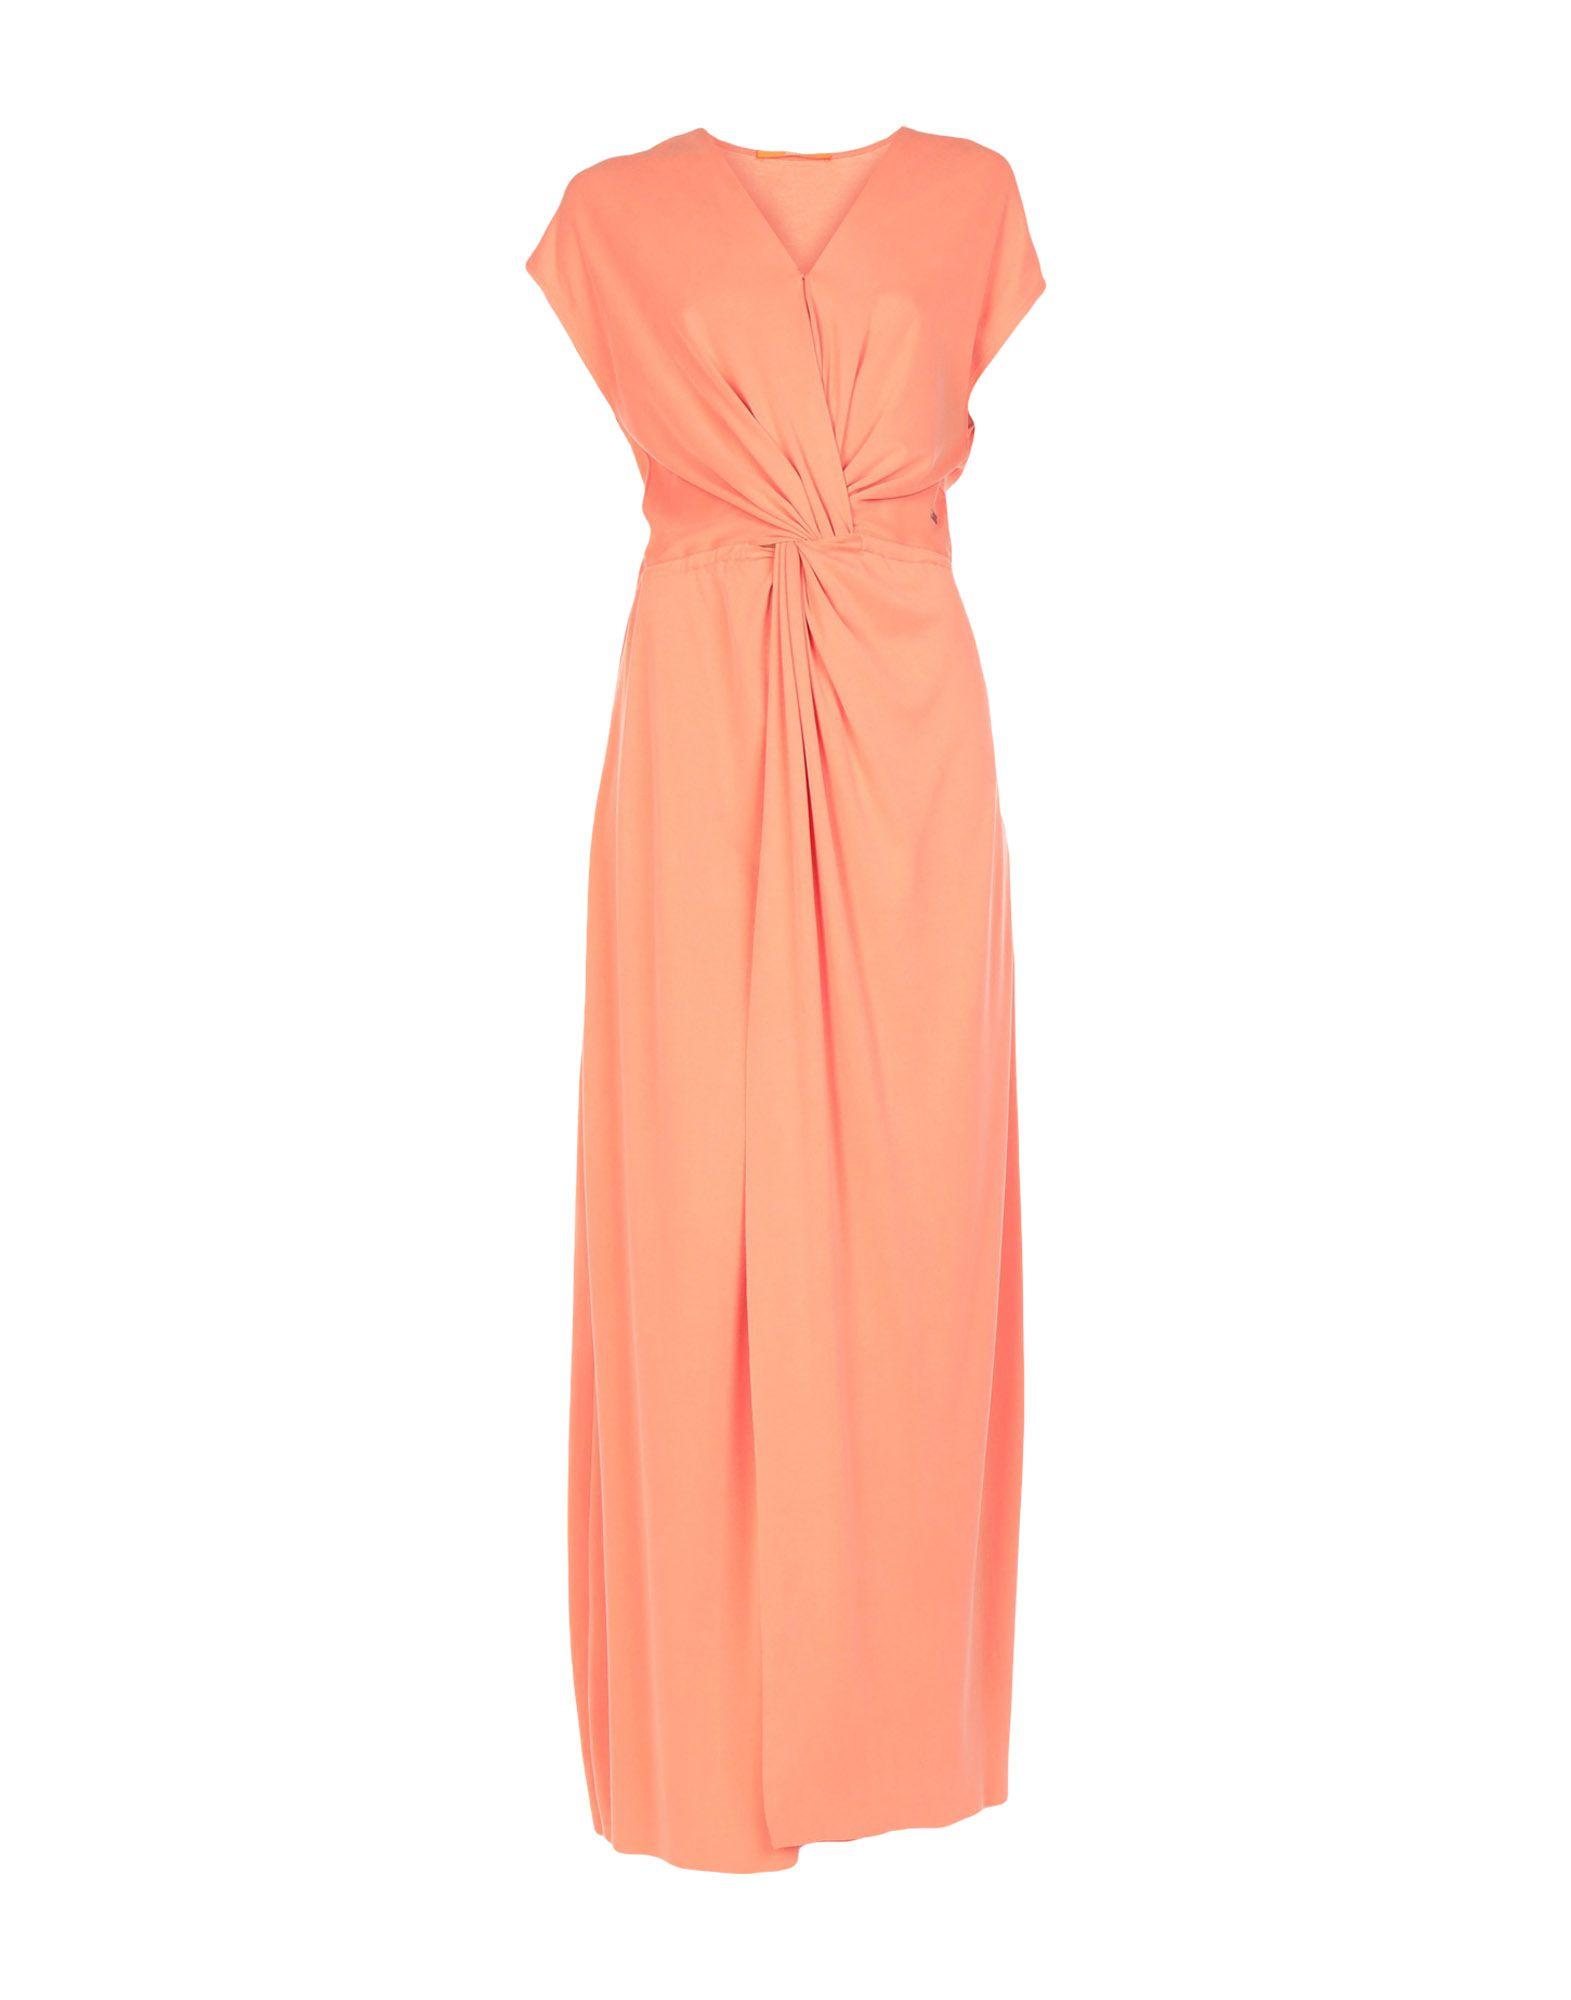 Boss Orange - Κορυφαία προϊόντα για ολοκληρωμένα Outfit - Σελίδα 1 ... 2407edd2804